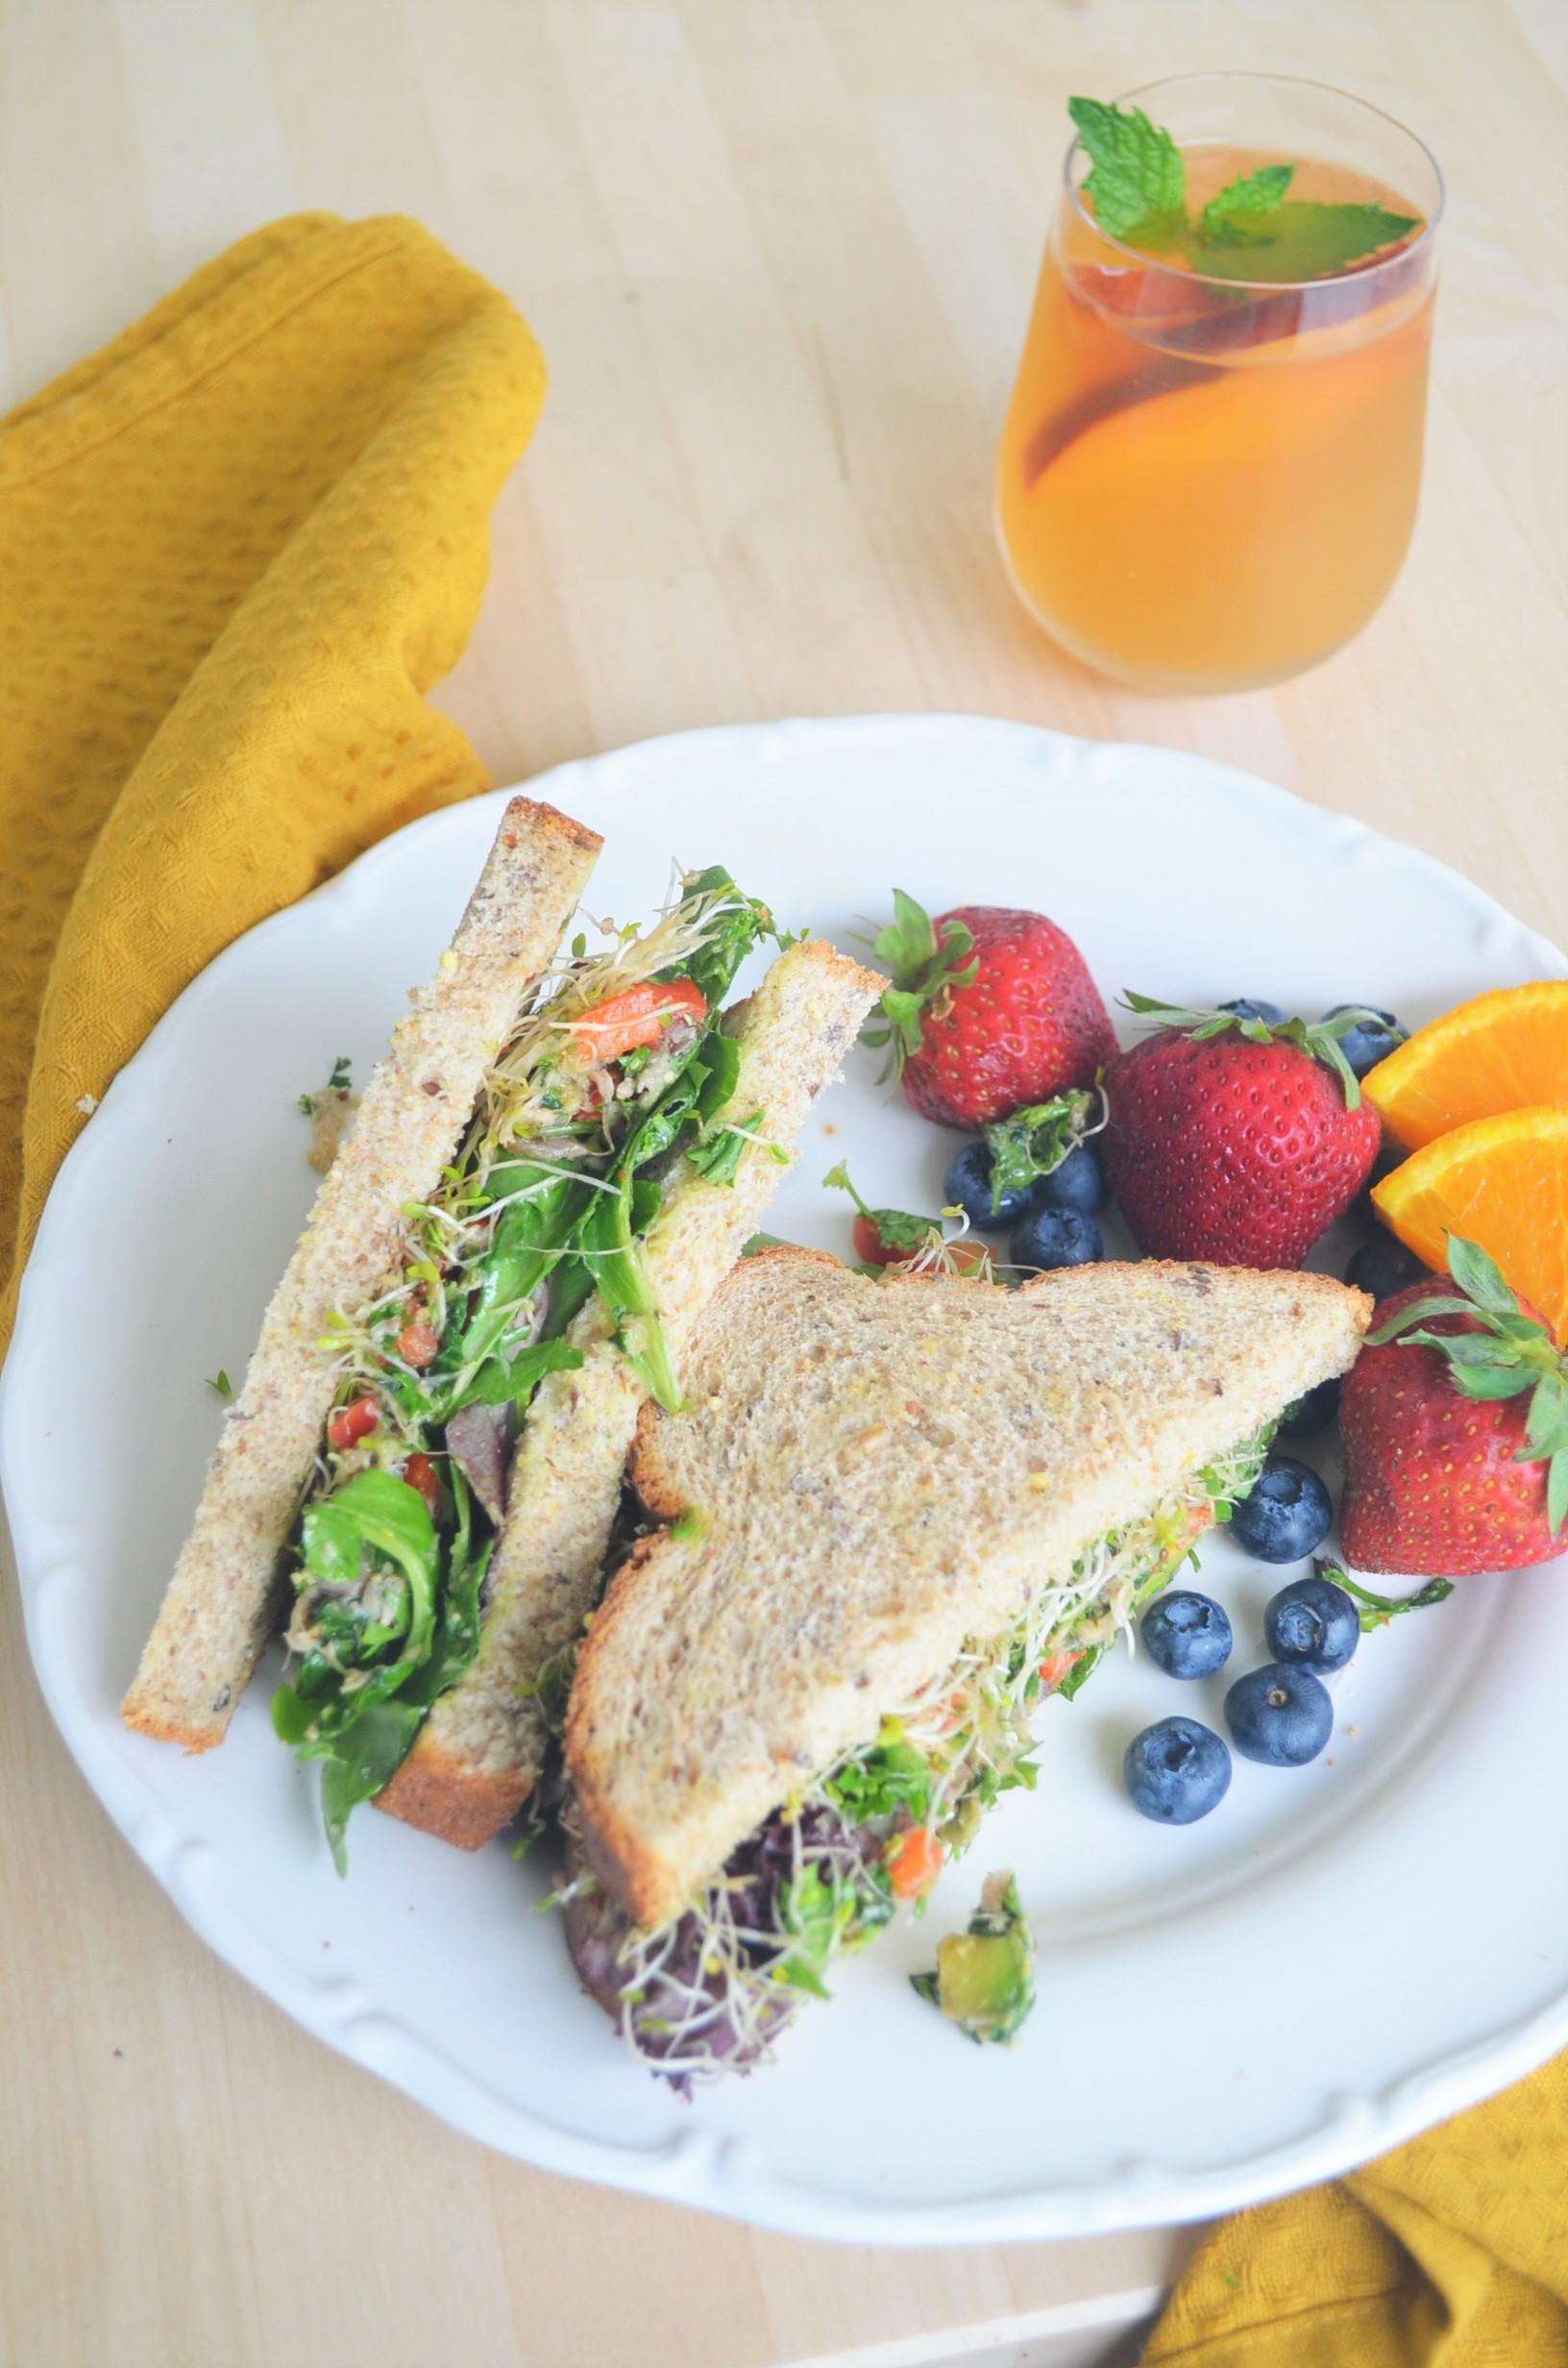 Avocado and Tuna Breakfast Sandwich